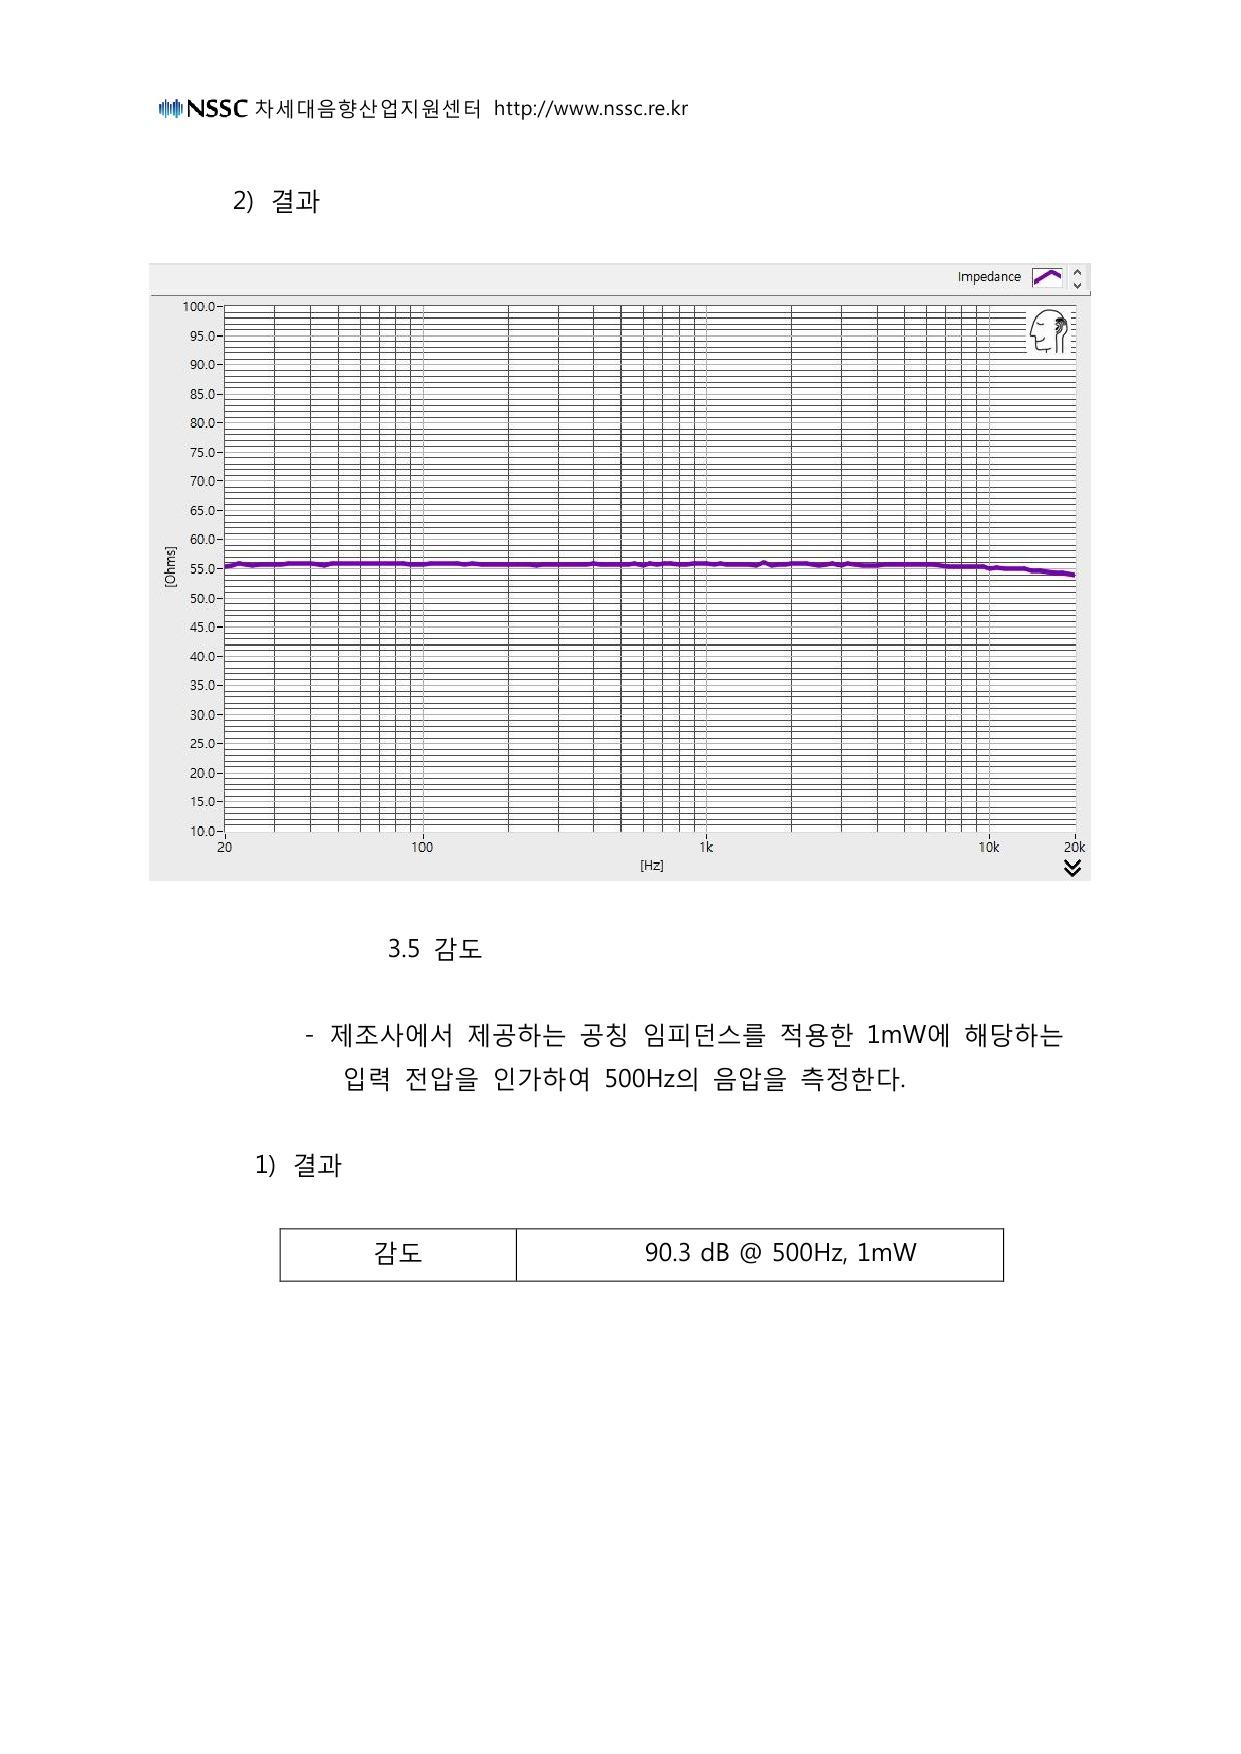 image-09.jpg